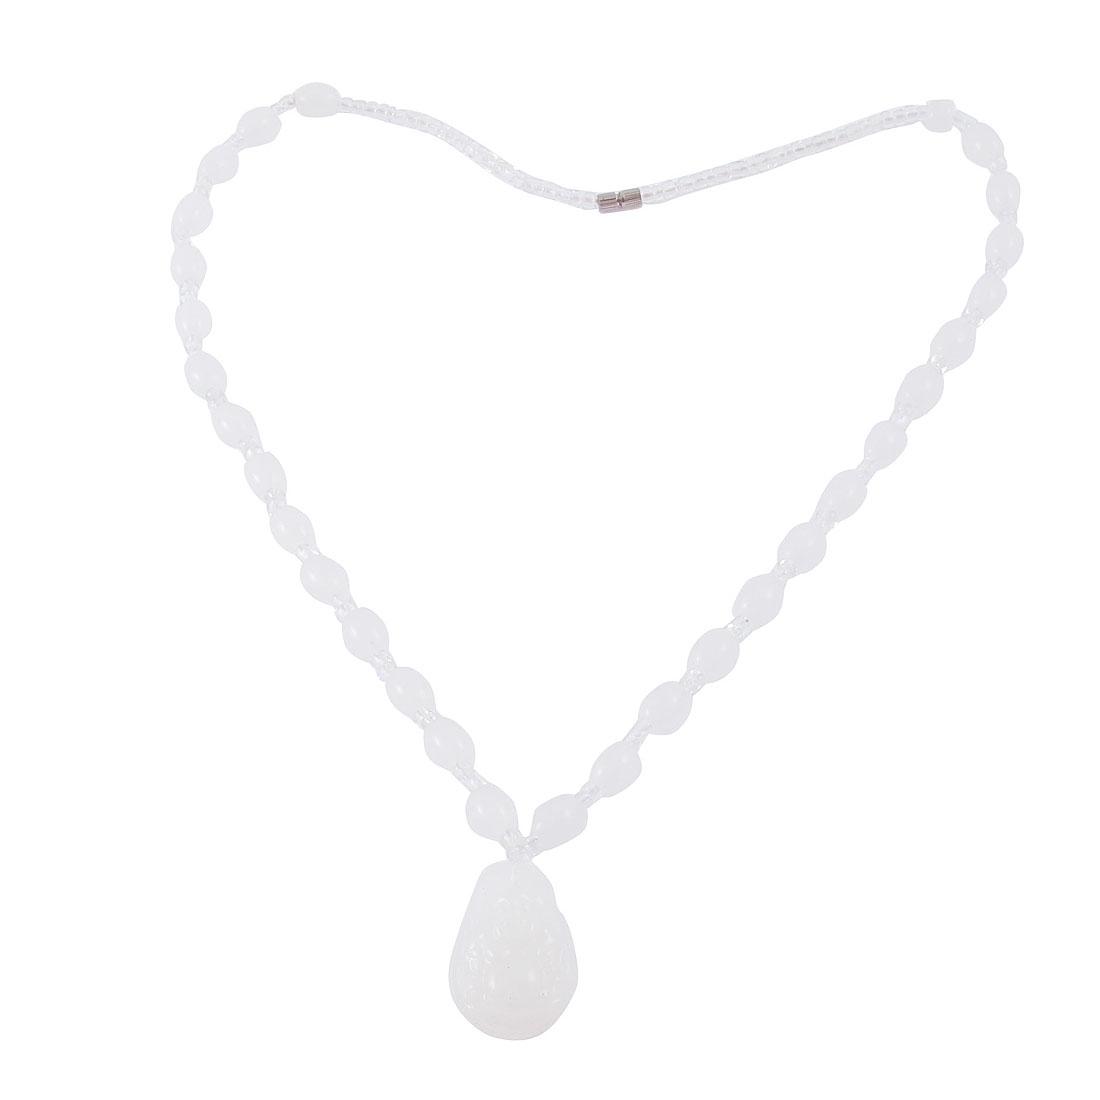 Screw Clasp White Faux Jade Stone Maitreya Buddha Pendant Necklace Neck Strap Chain Ornament